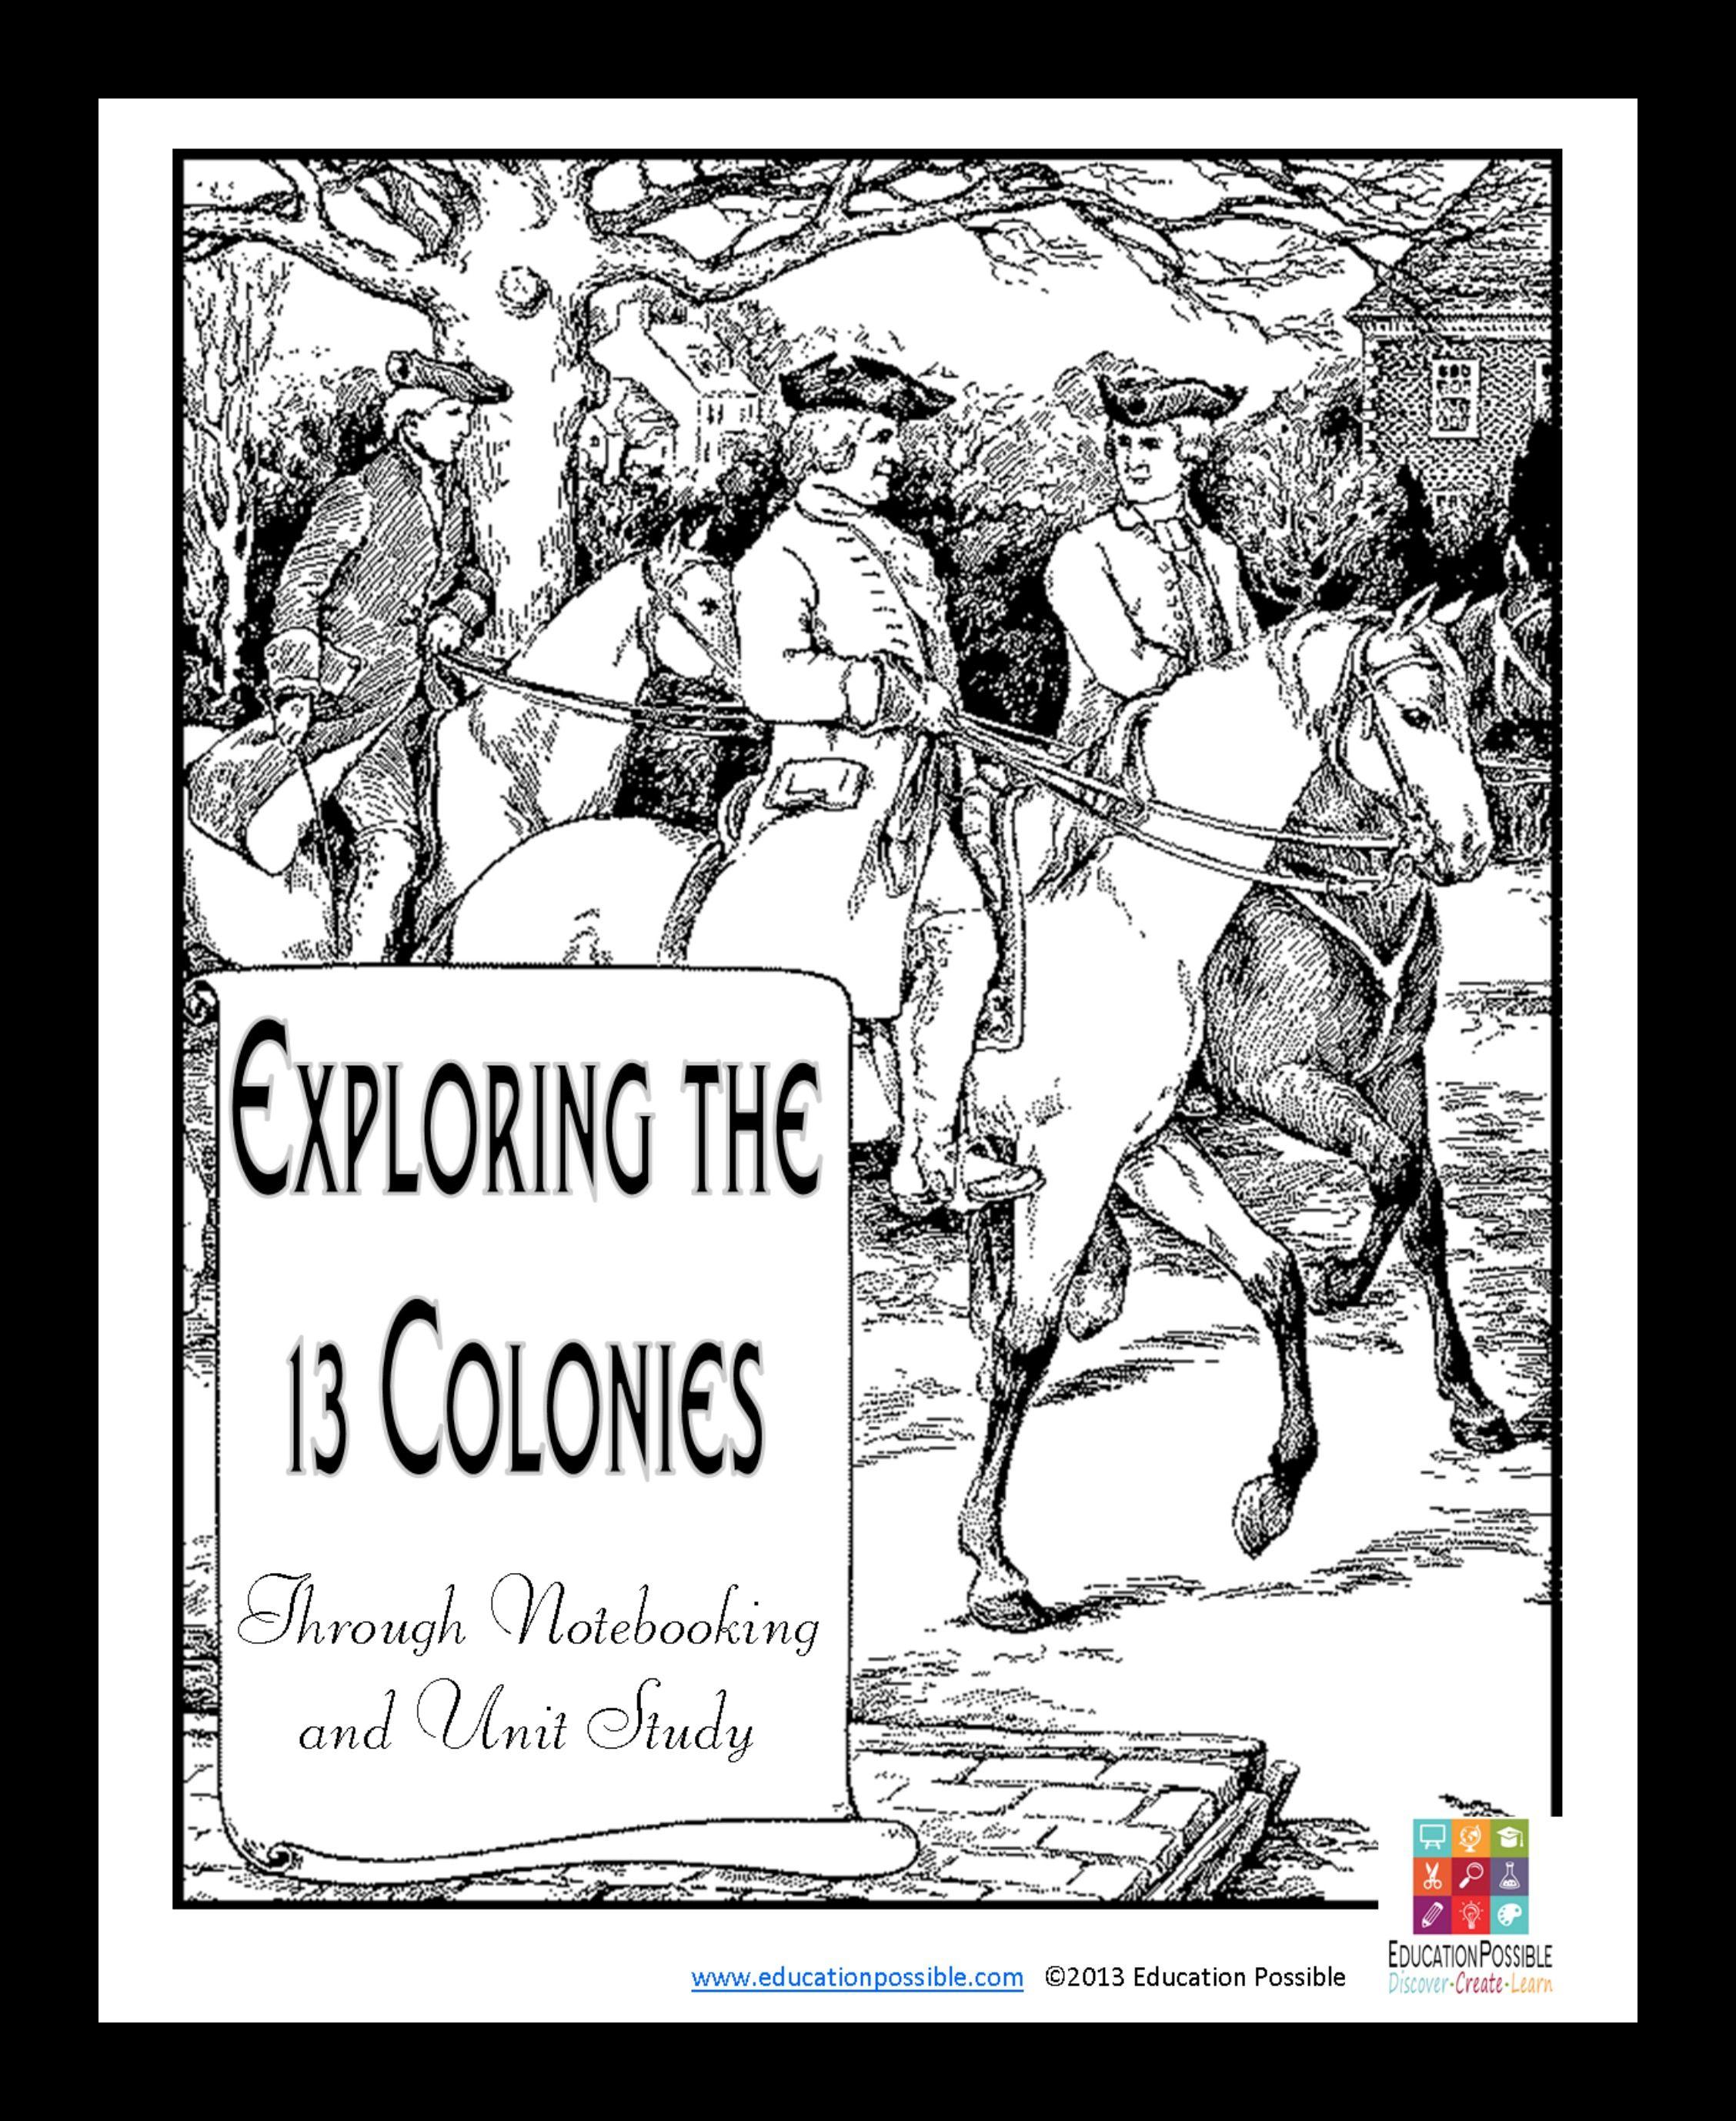 13 colonies activity worksheets student interactive notebook unit d036c9f55c858950208903a26f1e1276g publicscrutiny Images